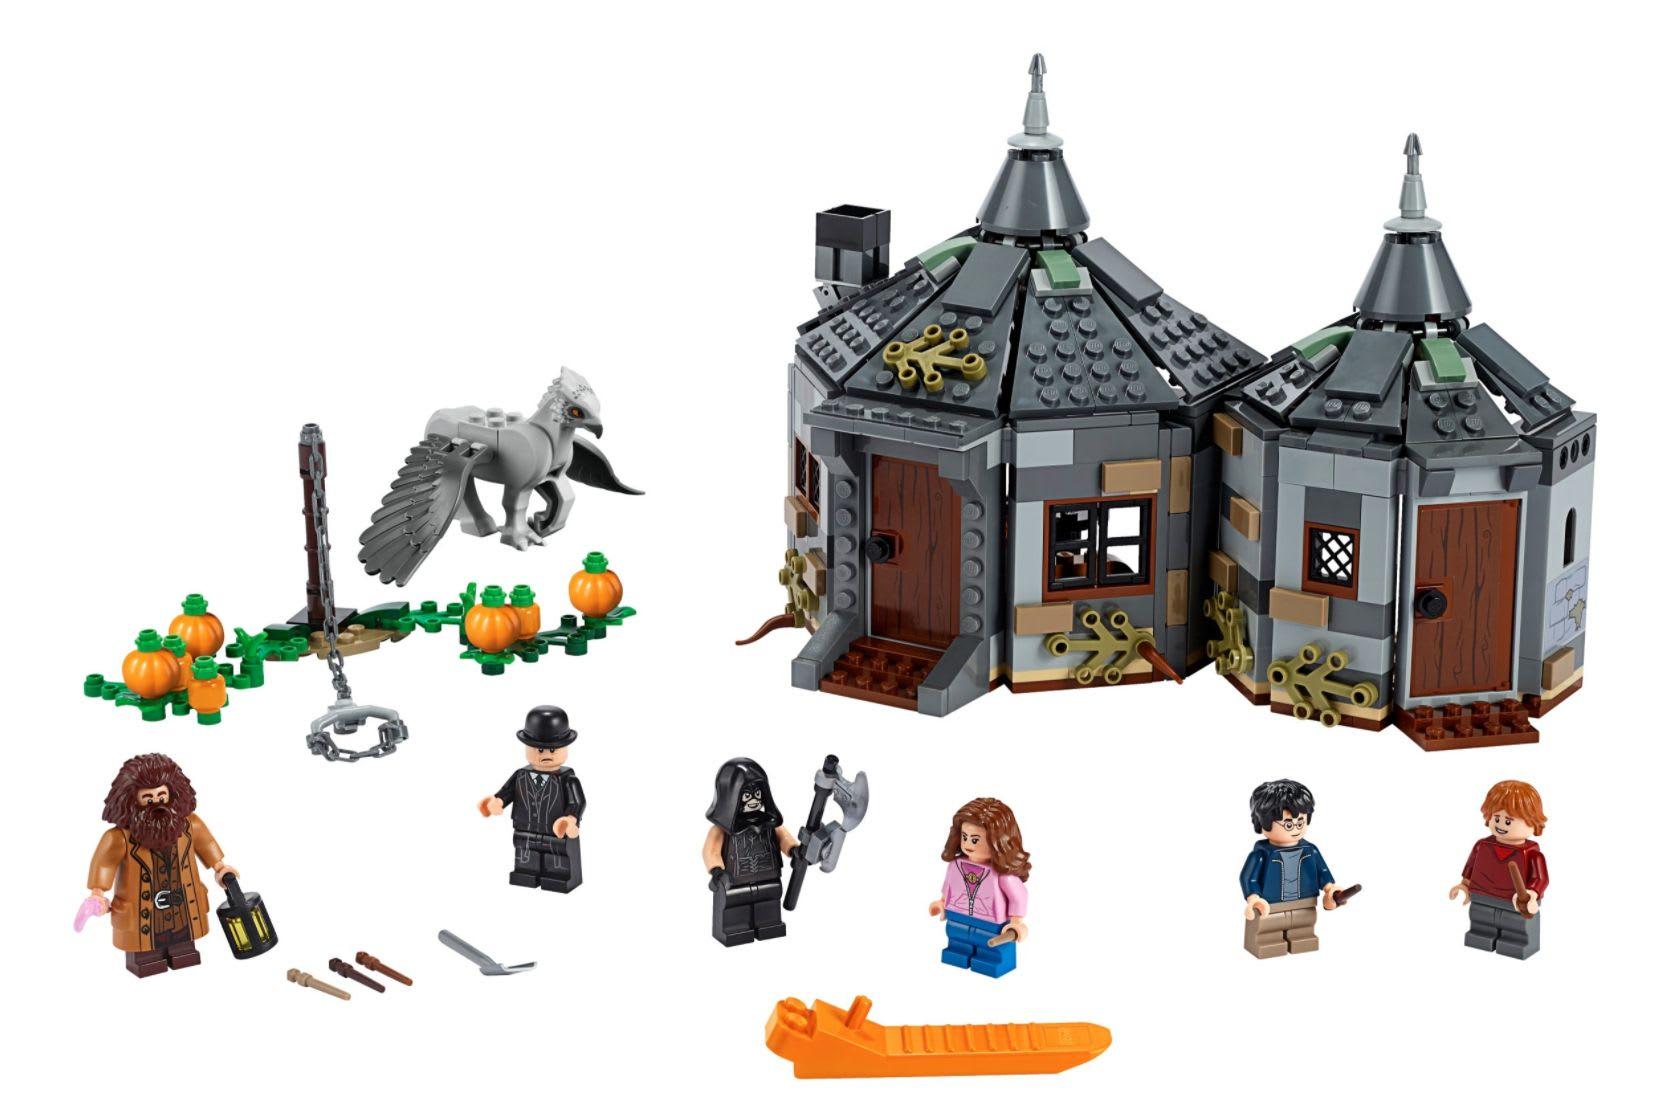 Discover the LEGO Harry Potter Hagrid's Hut: Buckbeak's Rescue set available at LEGO.